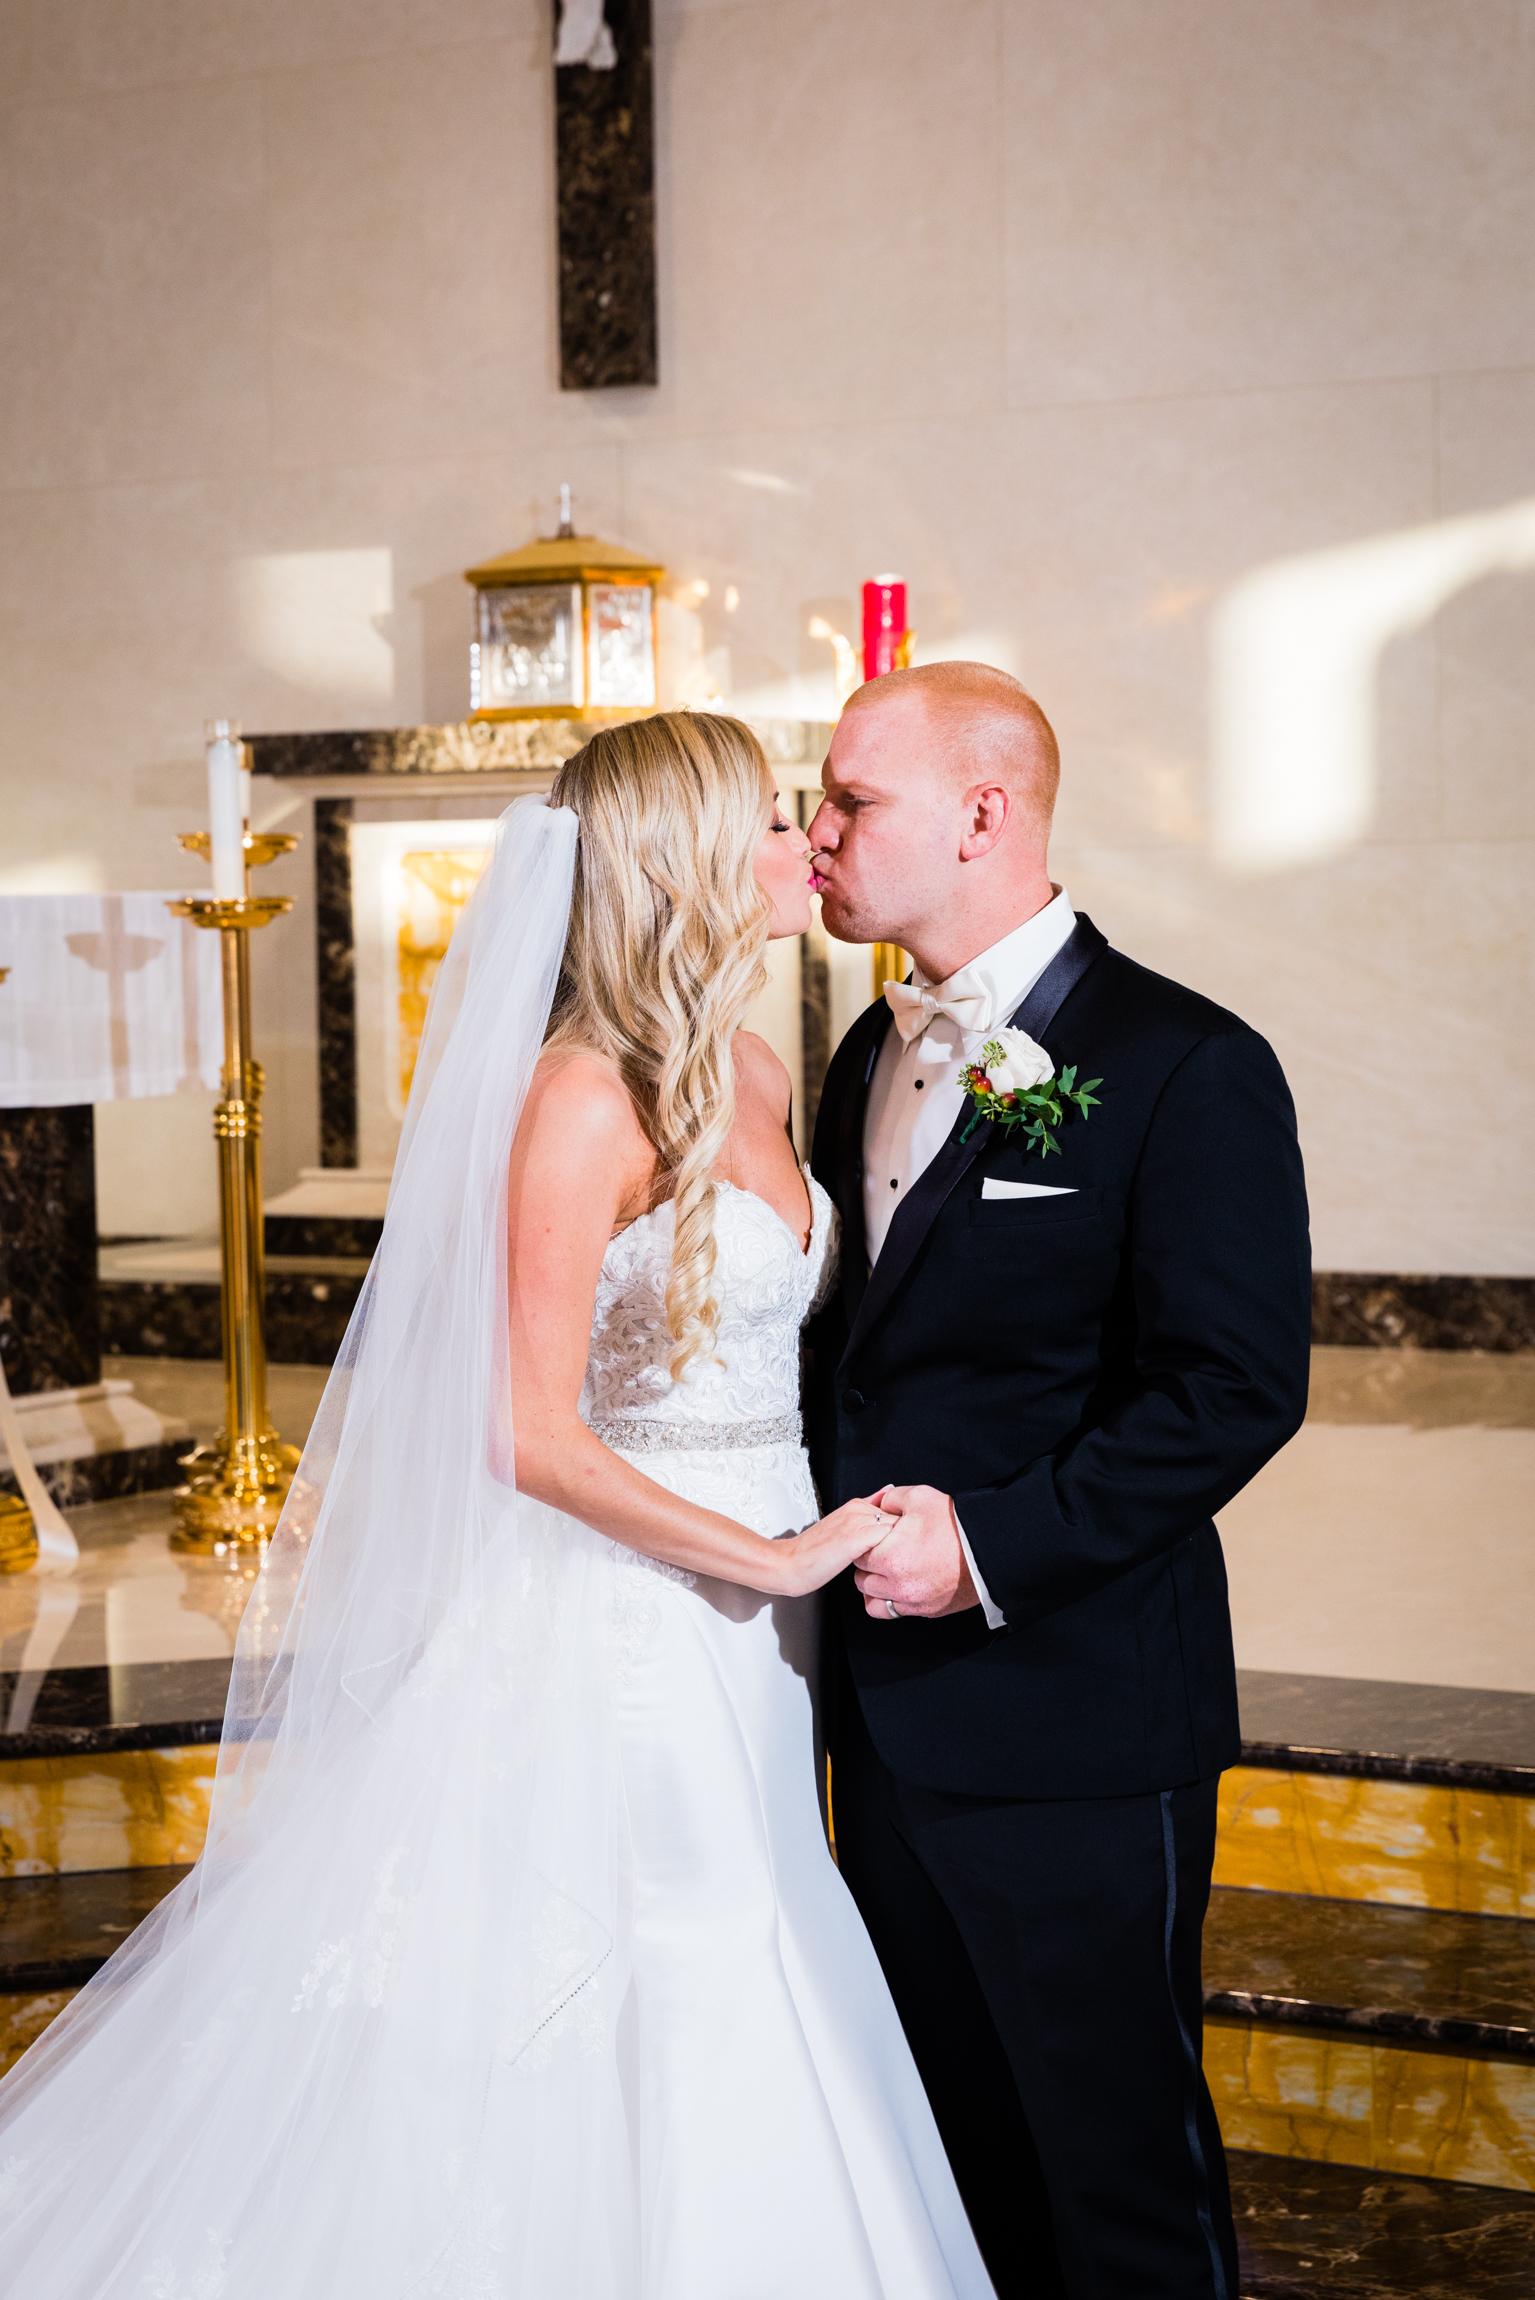 Luciens Manor - Wedding Photography -067.jpg